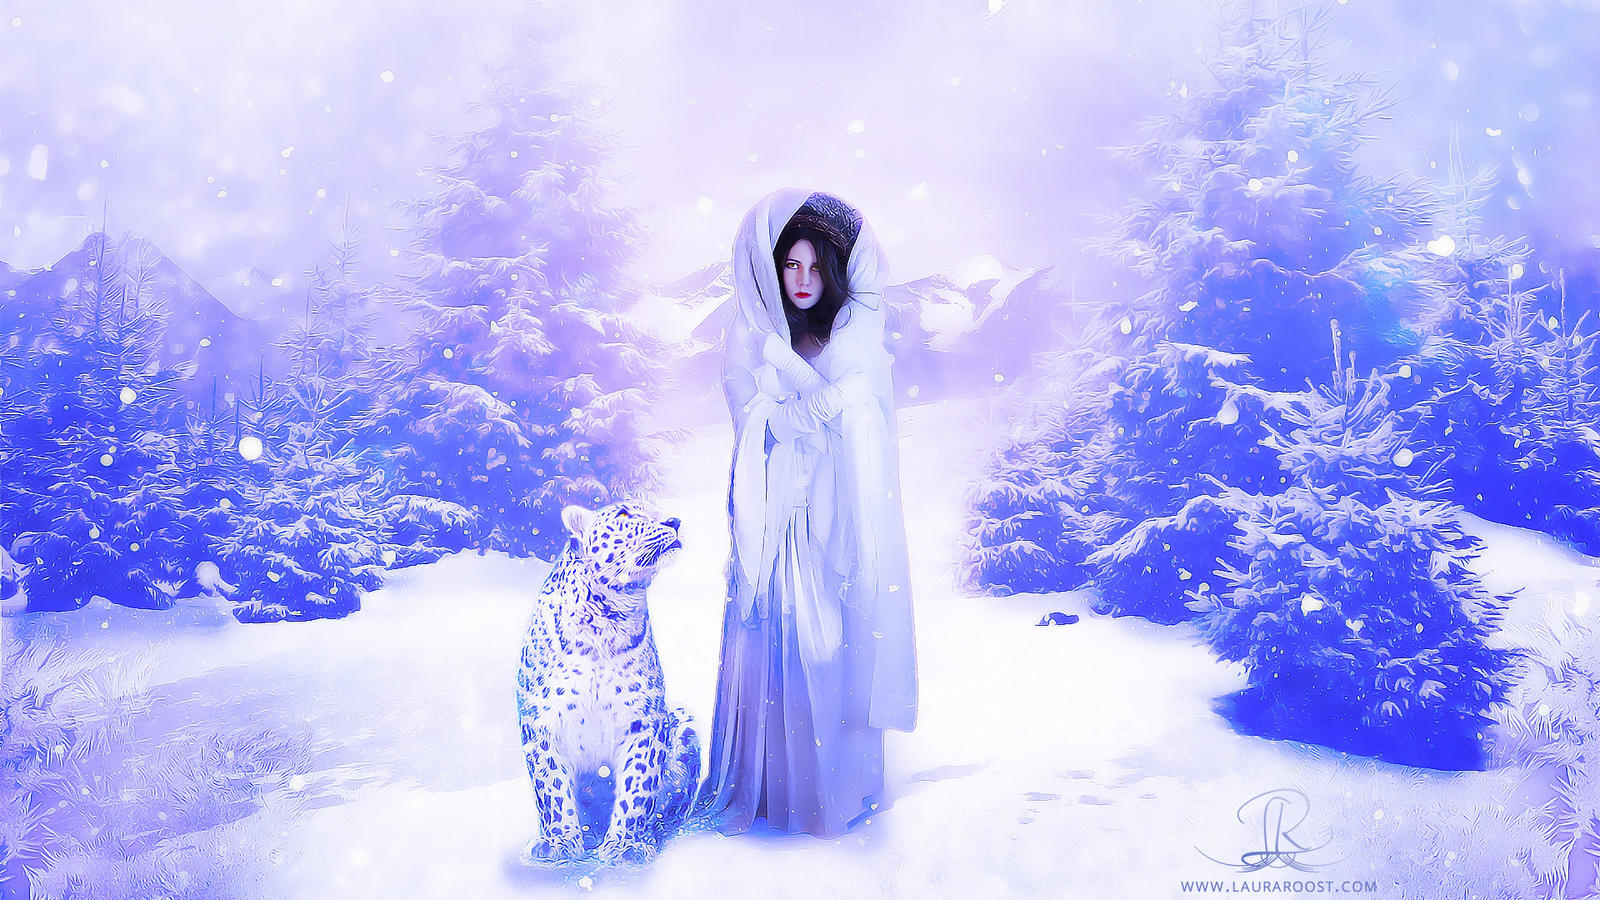 The winter queen and her fellow traveller